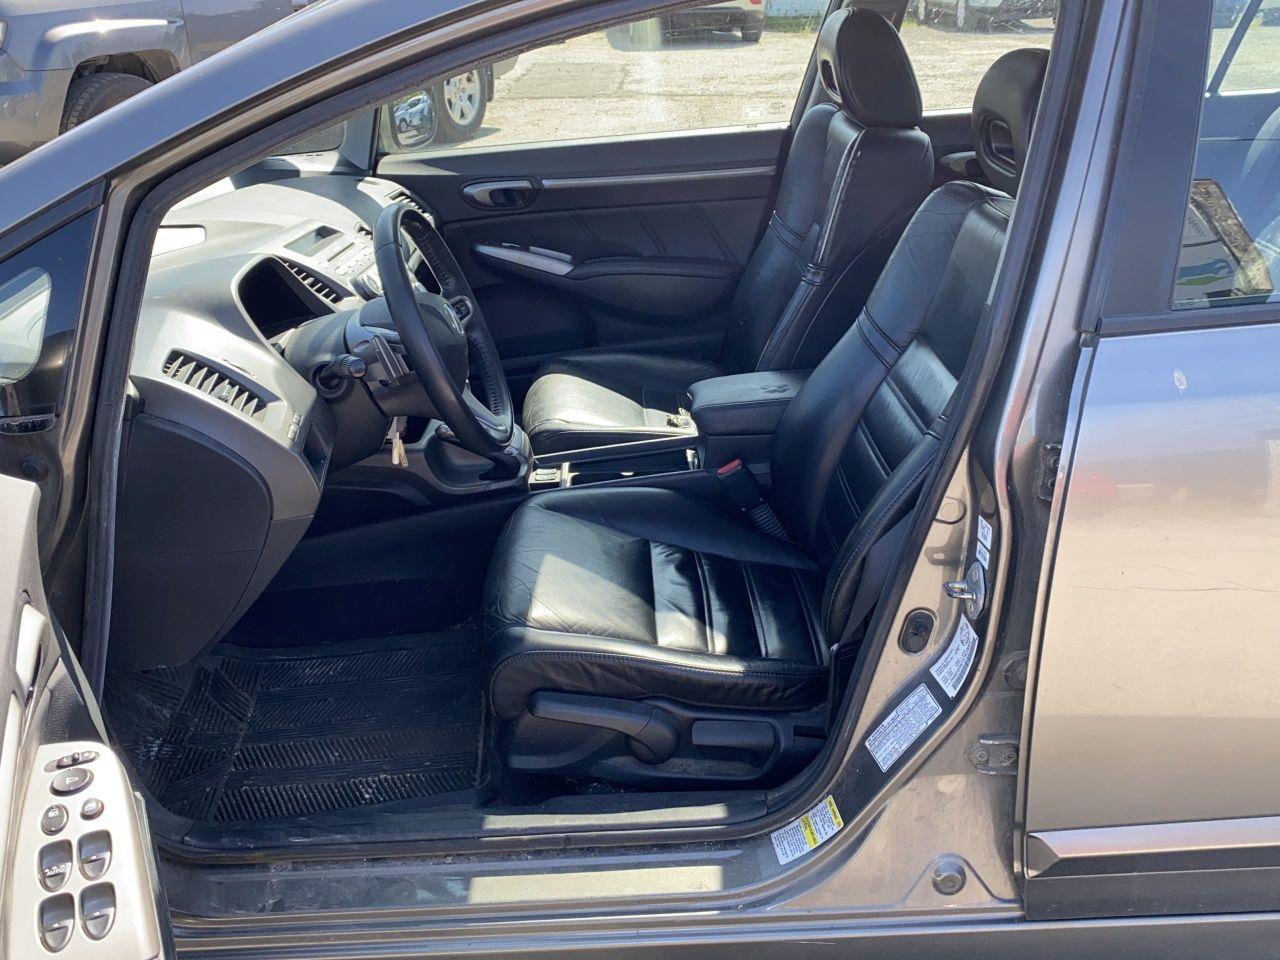 2007 Acura CSX